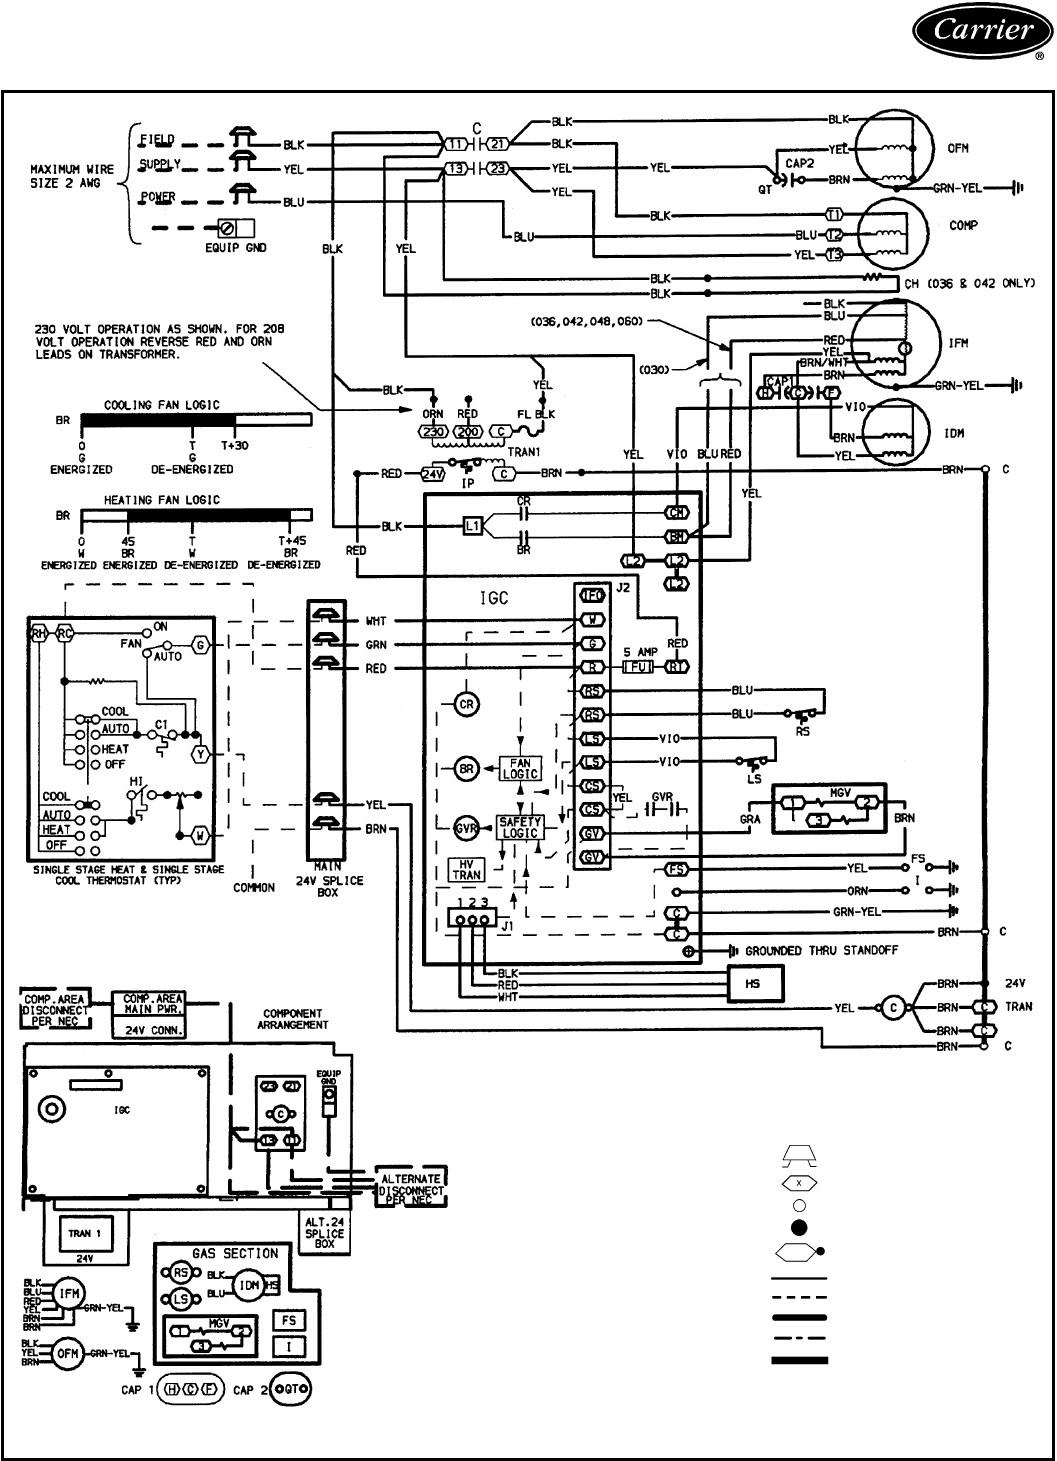 Power Acoustik Wiring Diagram   Manual E-Books - Power Acoustik Pdn-626B Wiring Diagram